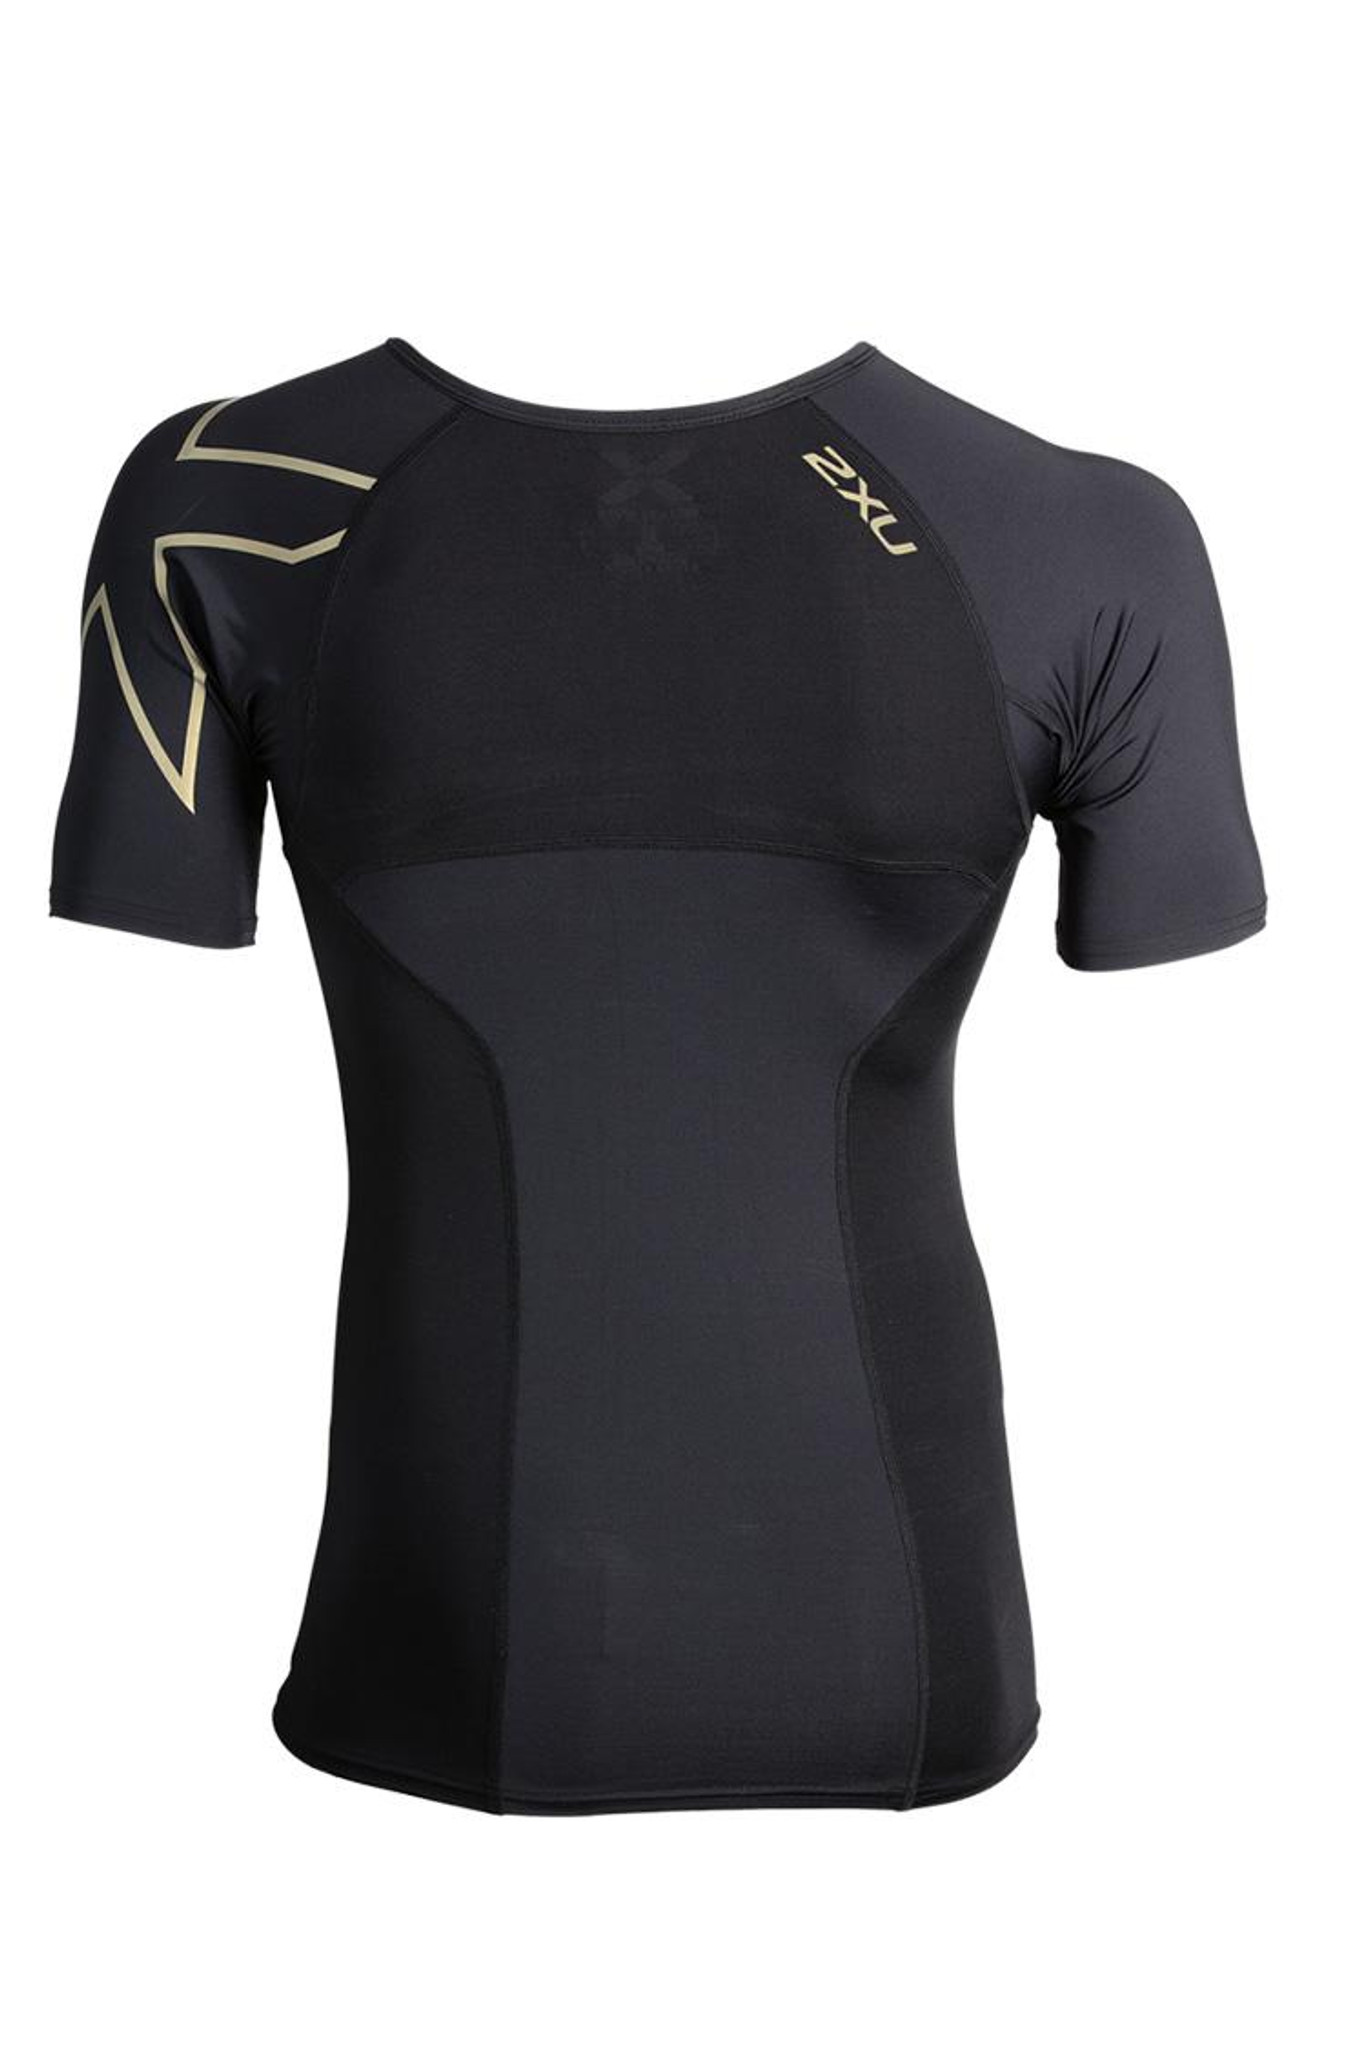 2XU Womens Elite Compresi/ón T-Shirt